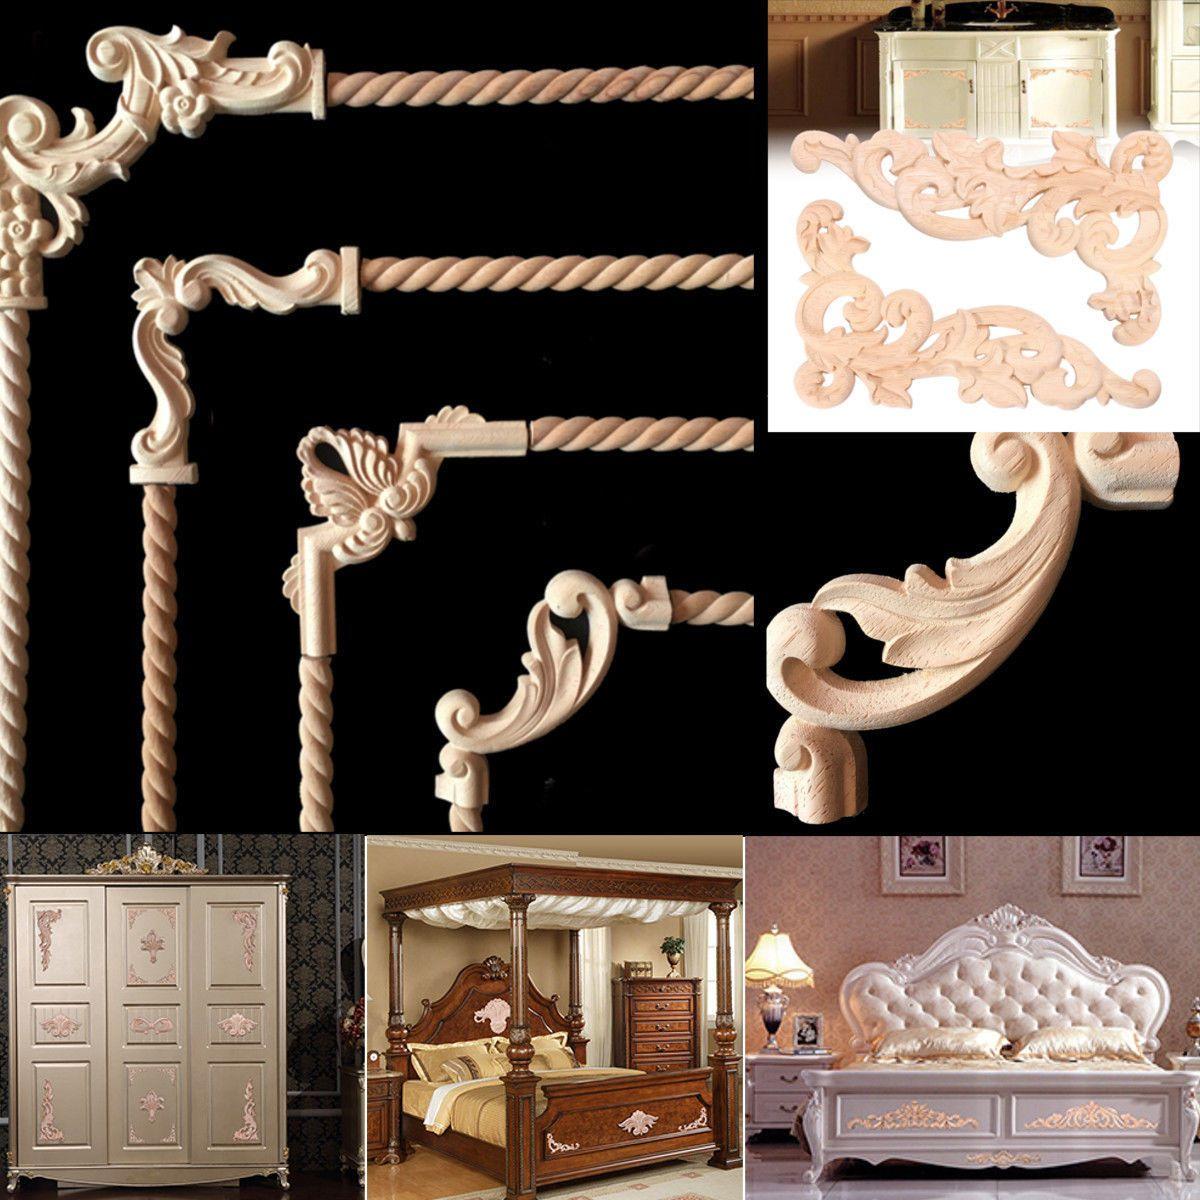 Corner Onlay Applique Furniture Home Door Decor Unfinished Handmade Wood Carved